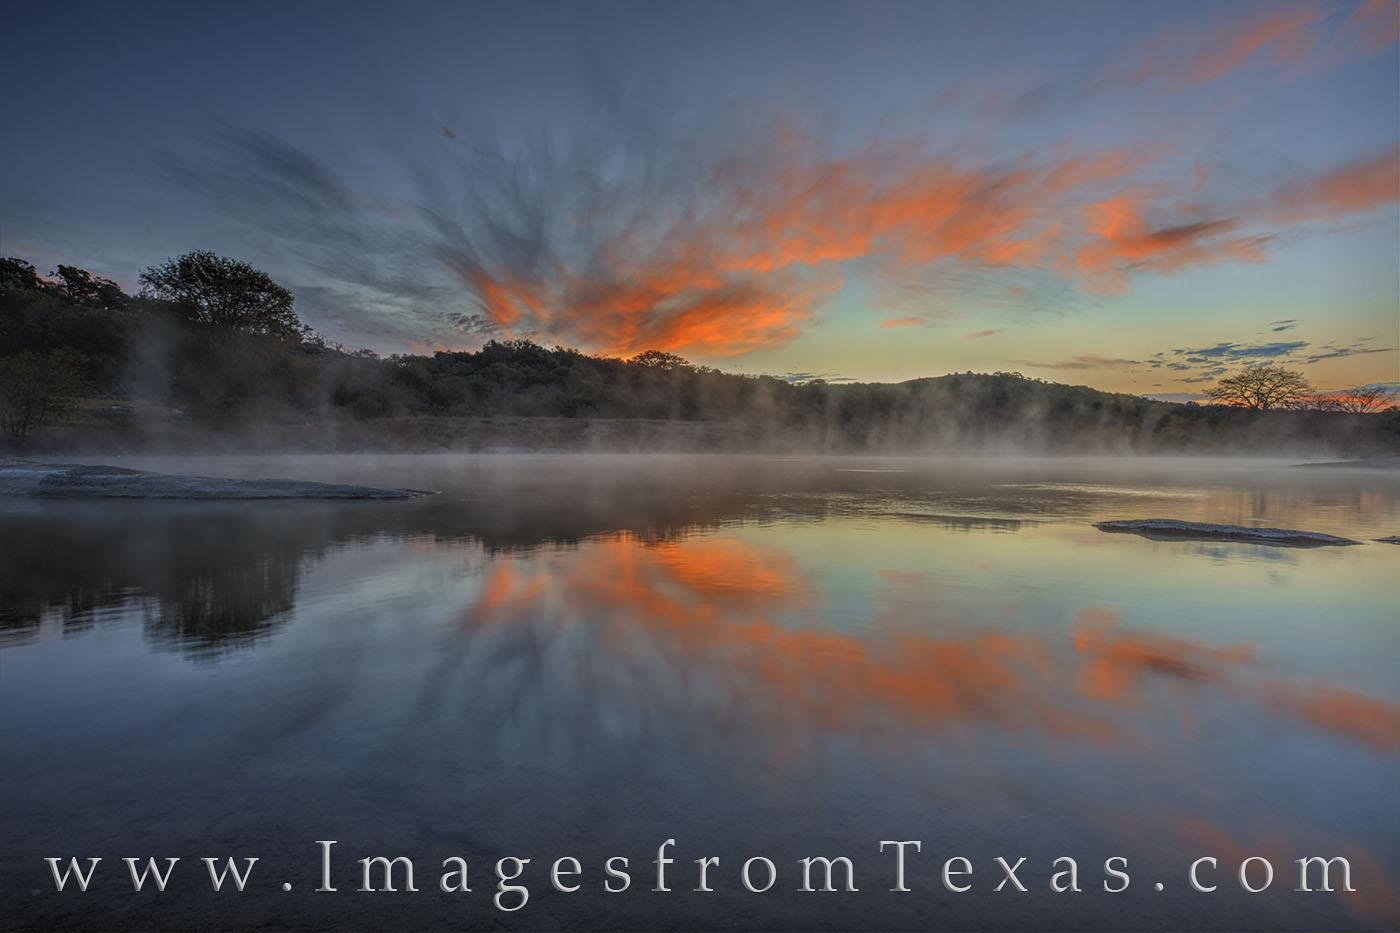 texas hill country, pedernales river, pedernales falls, sunrise, texas sunrise, november, morning, photo